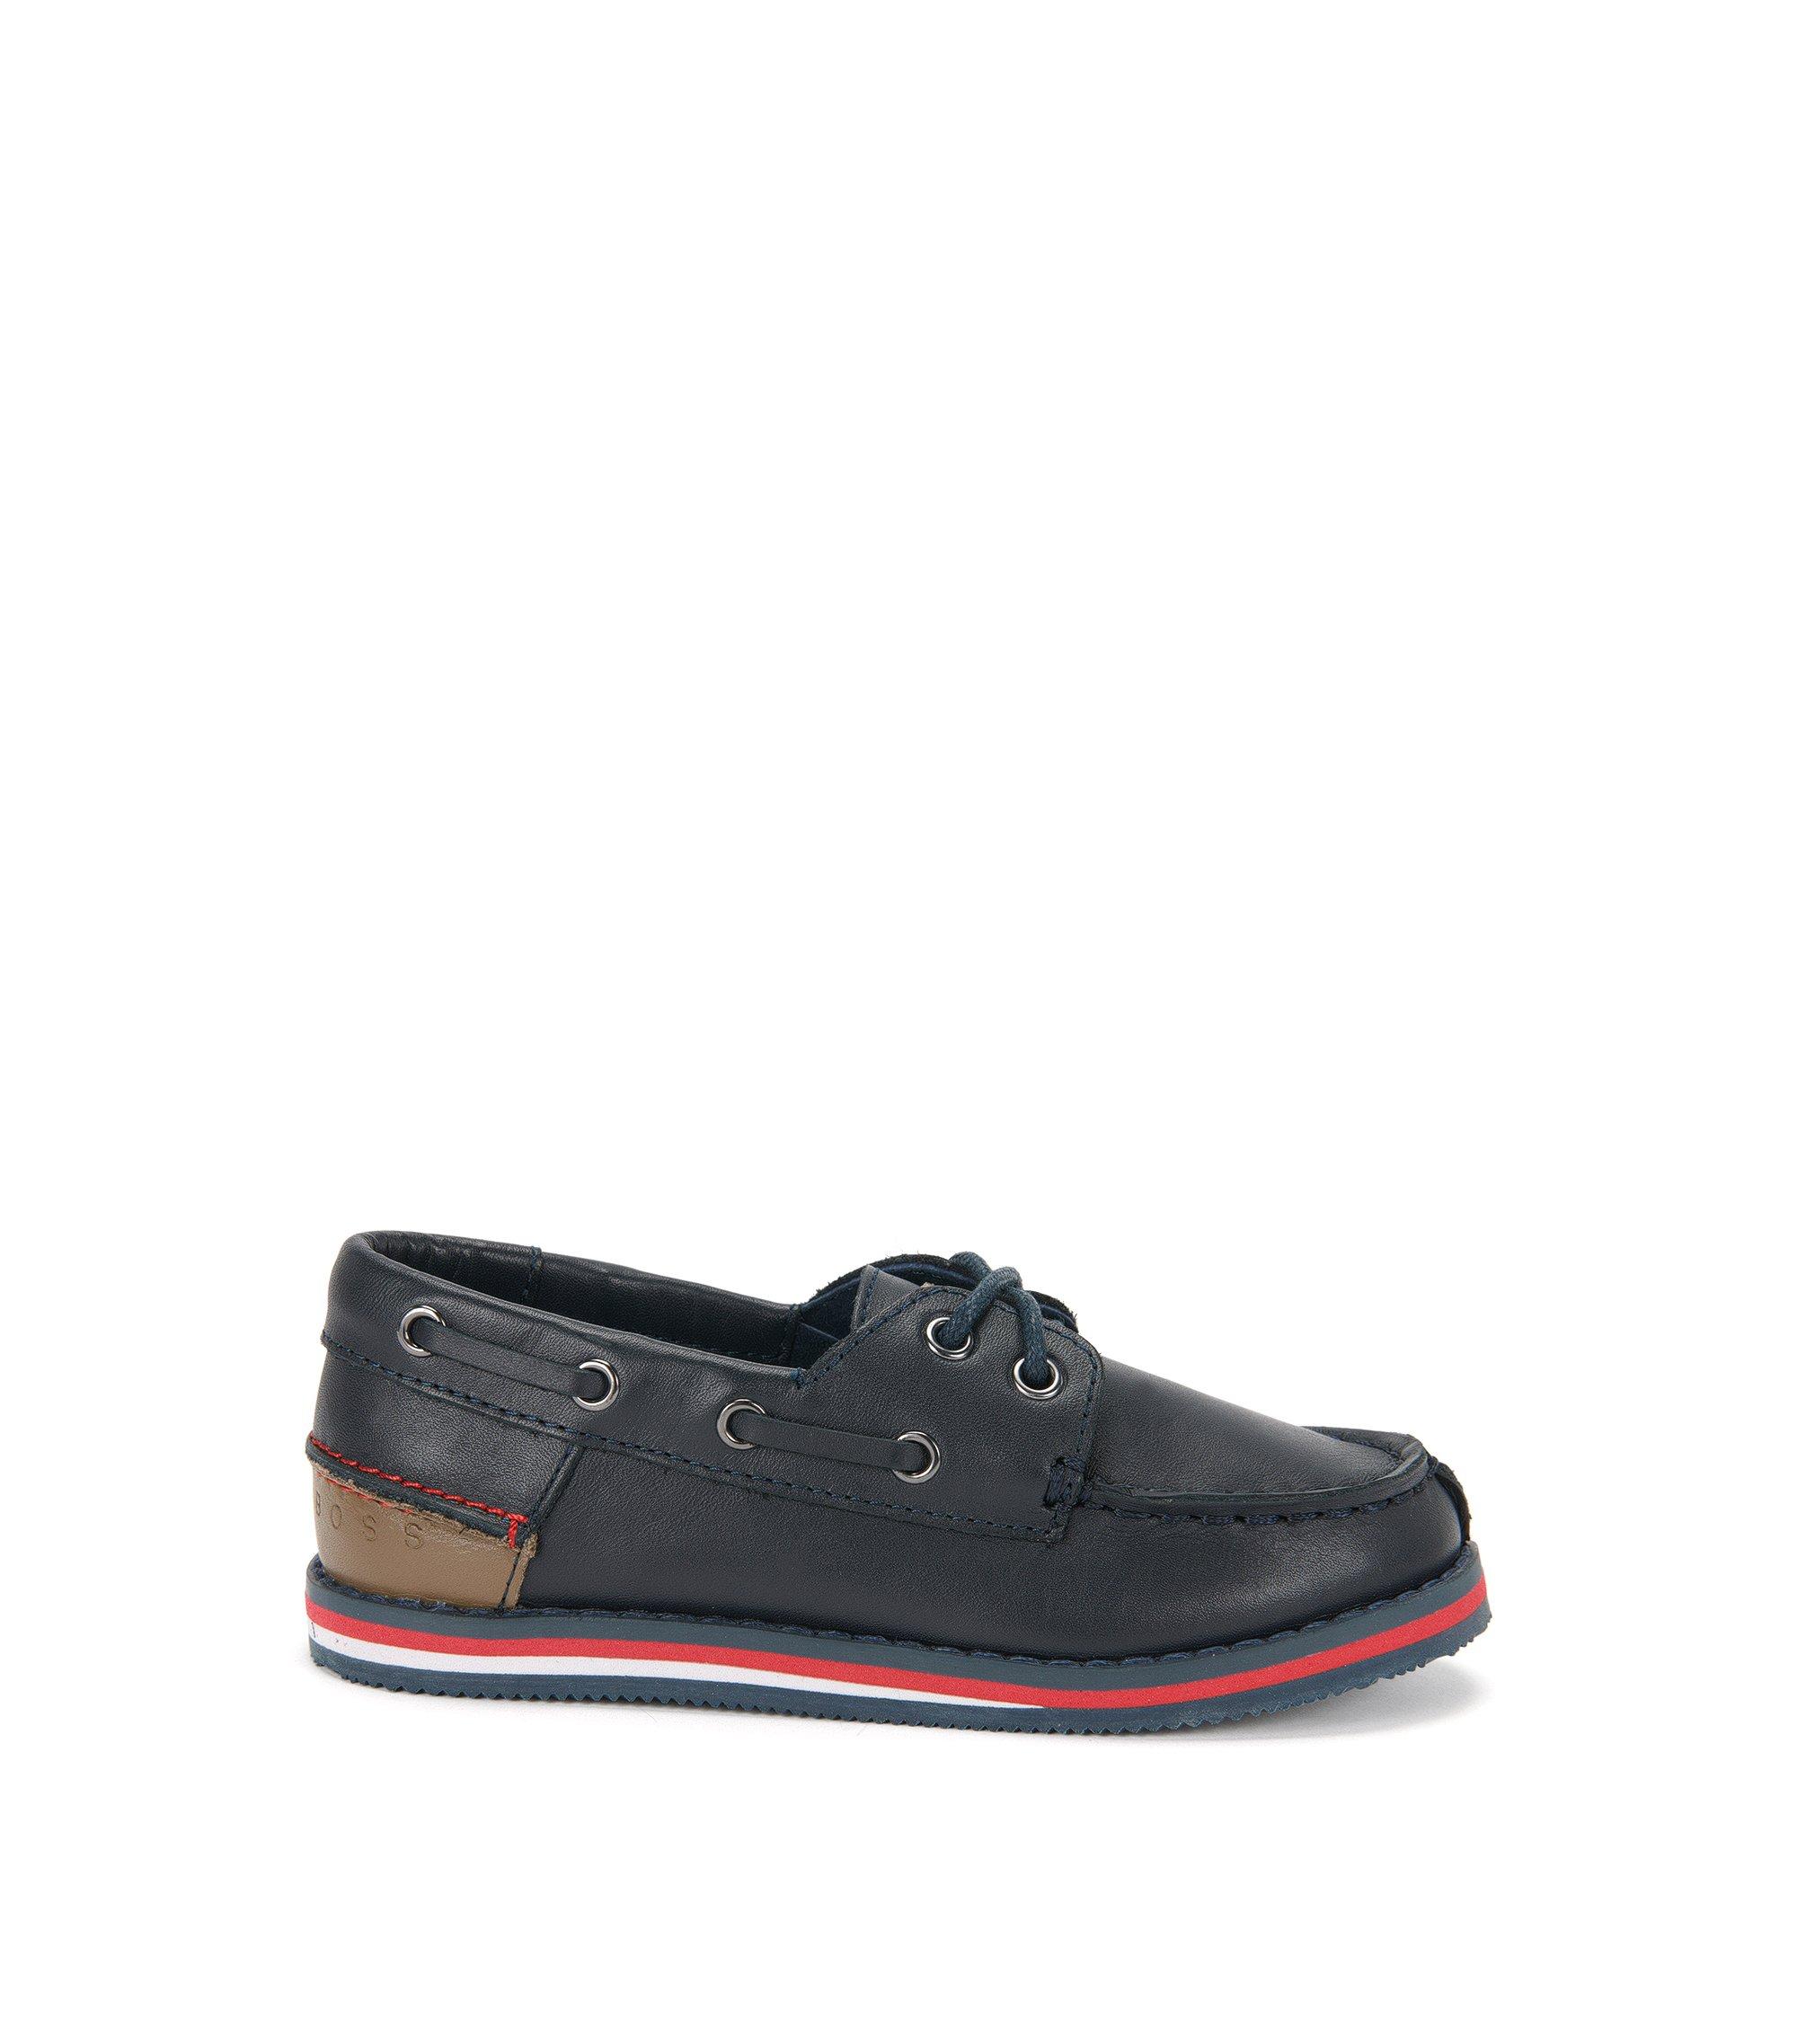 'J29116' | Boys Leather Boat Shoes, Dark Blue